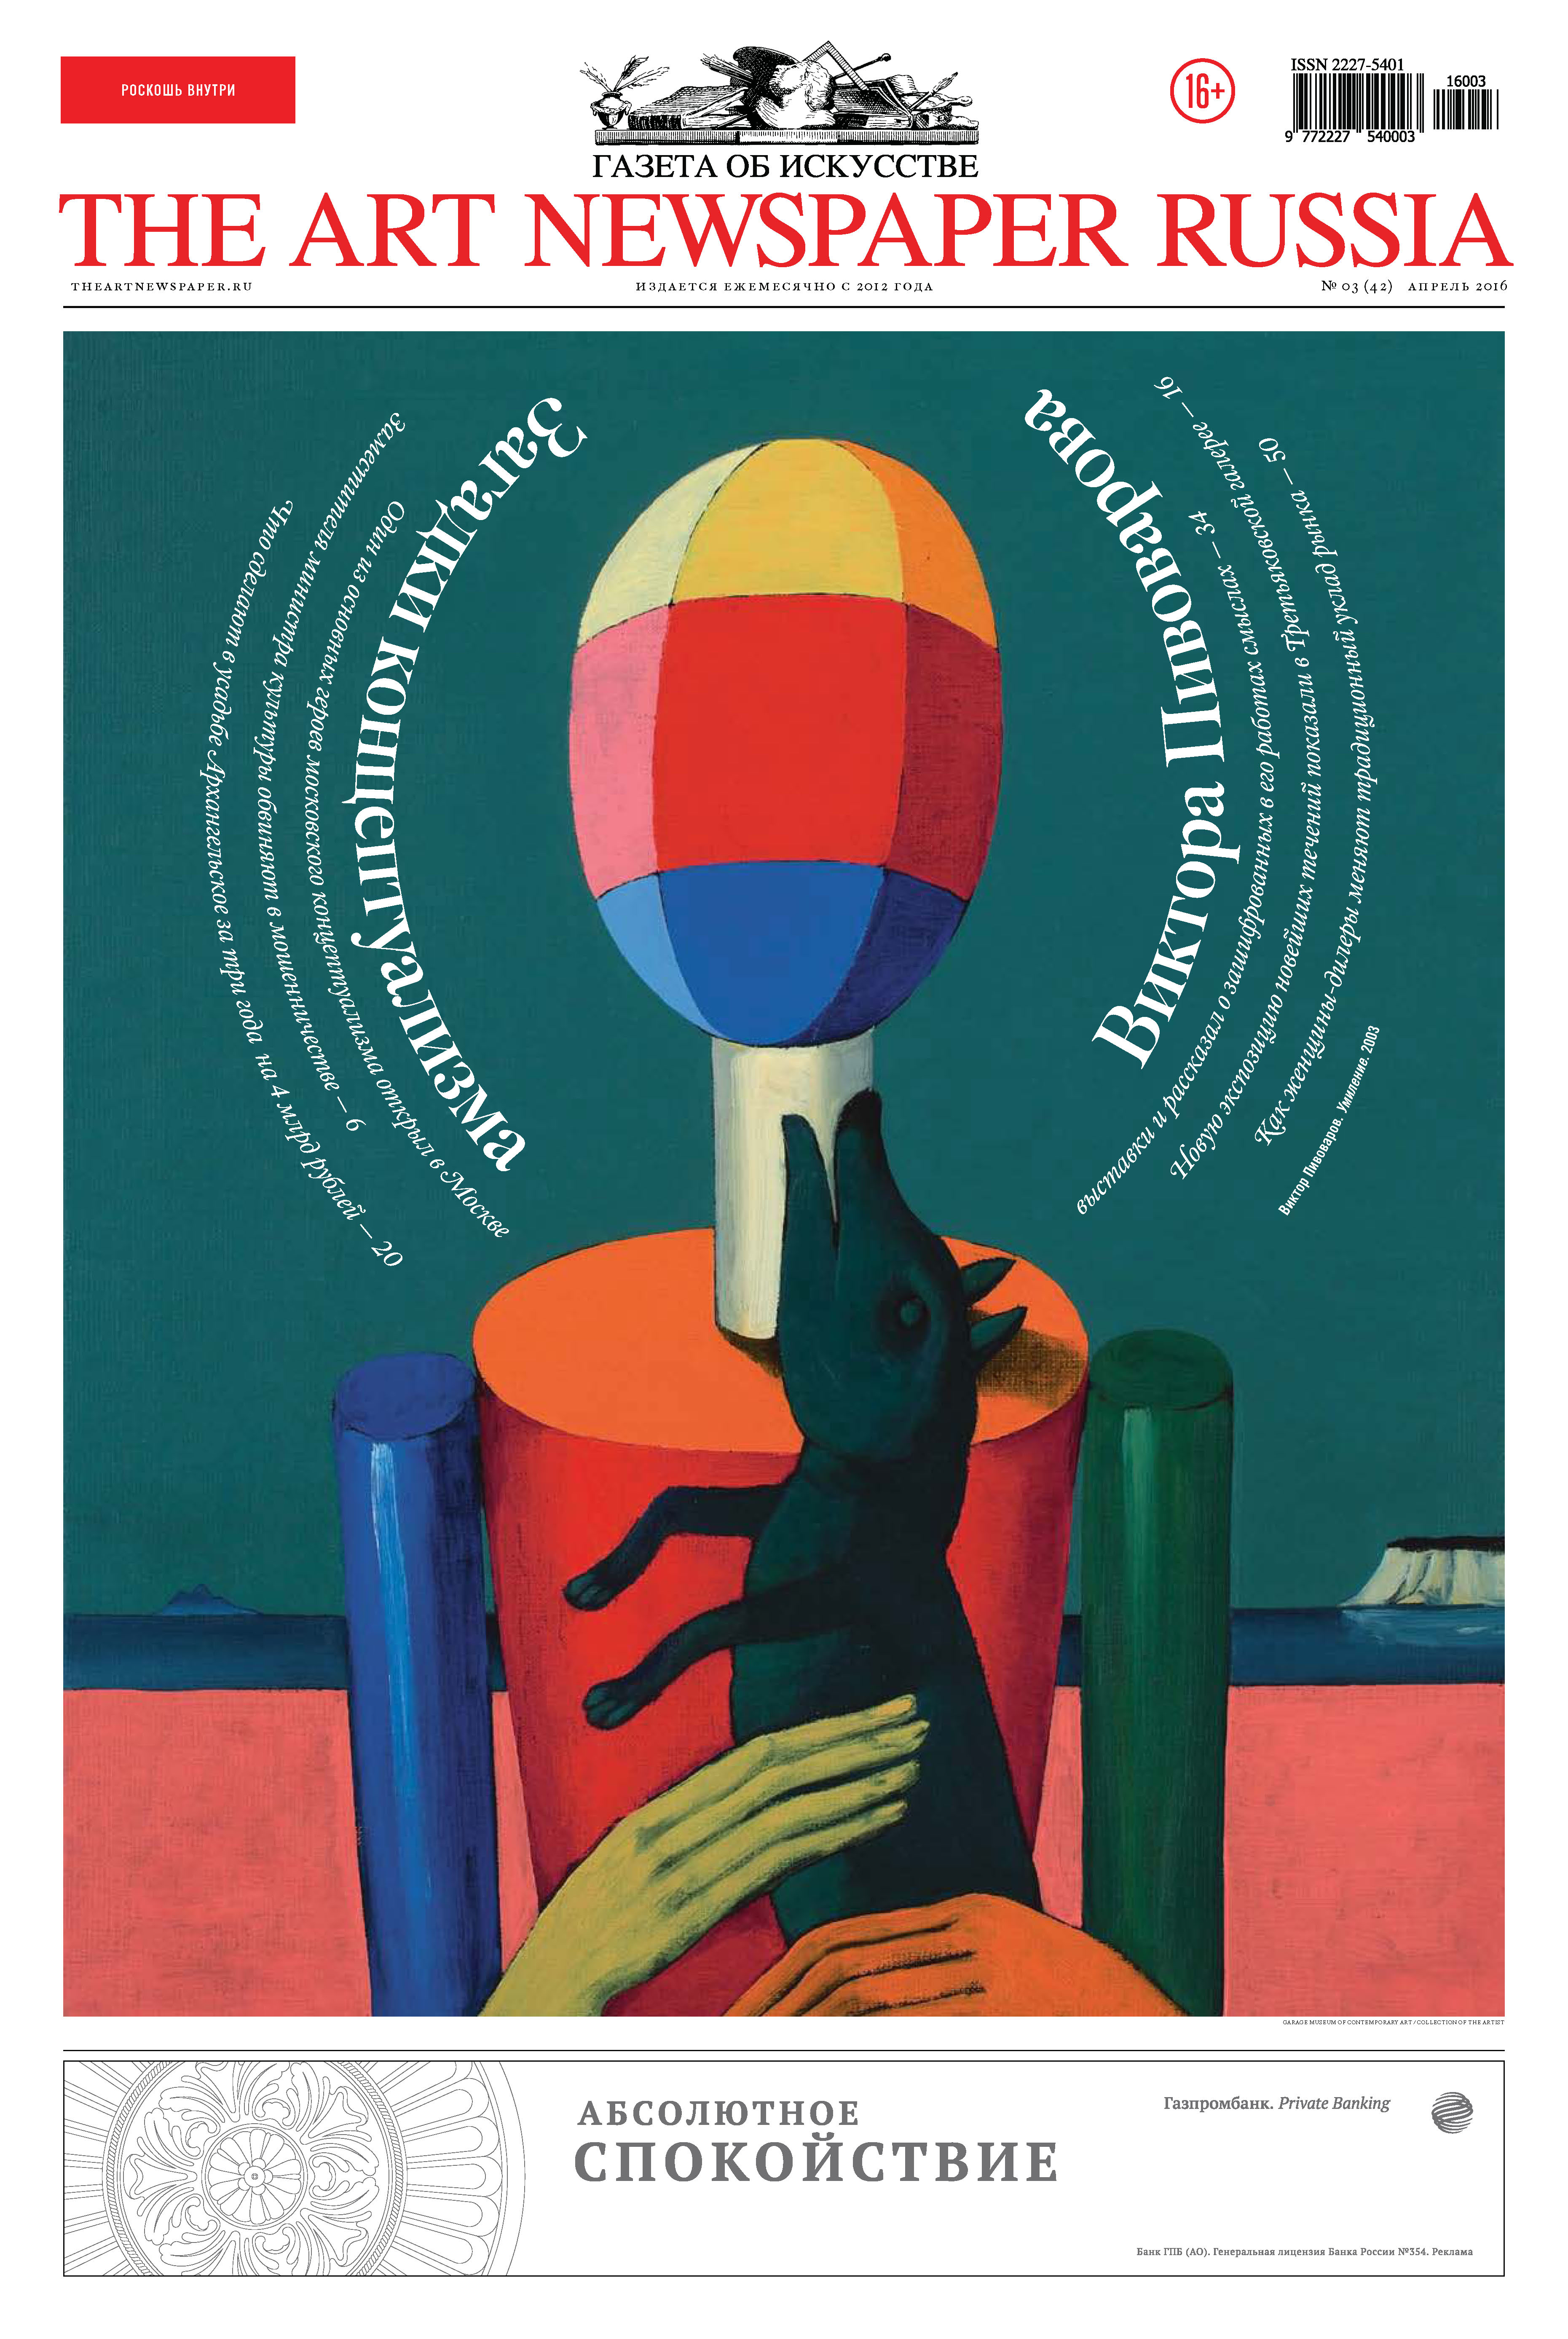 Отсутствует The Art Newspaper Russia №03 / апрель 2016 rachele kanigel the student newspaper survival guide